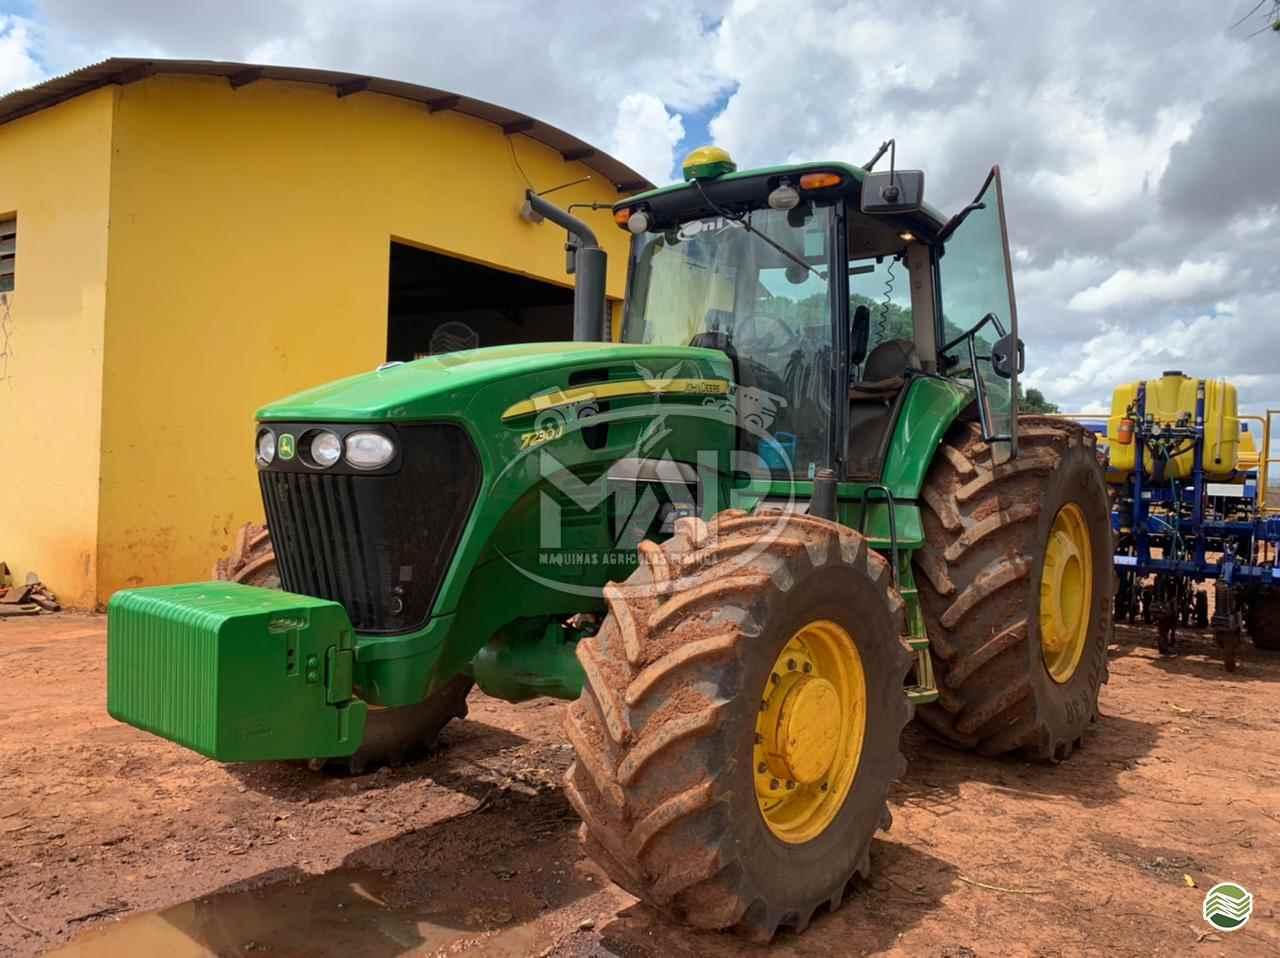 TRATOR JOHN DEERE JOHN DEERE 7230 Tração 4x4 Máquinas Agrícolas Pitanga PITANGA PARANÁ PR